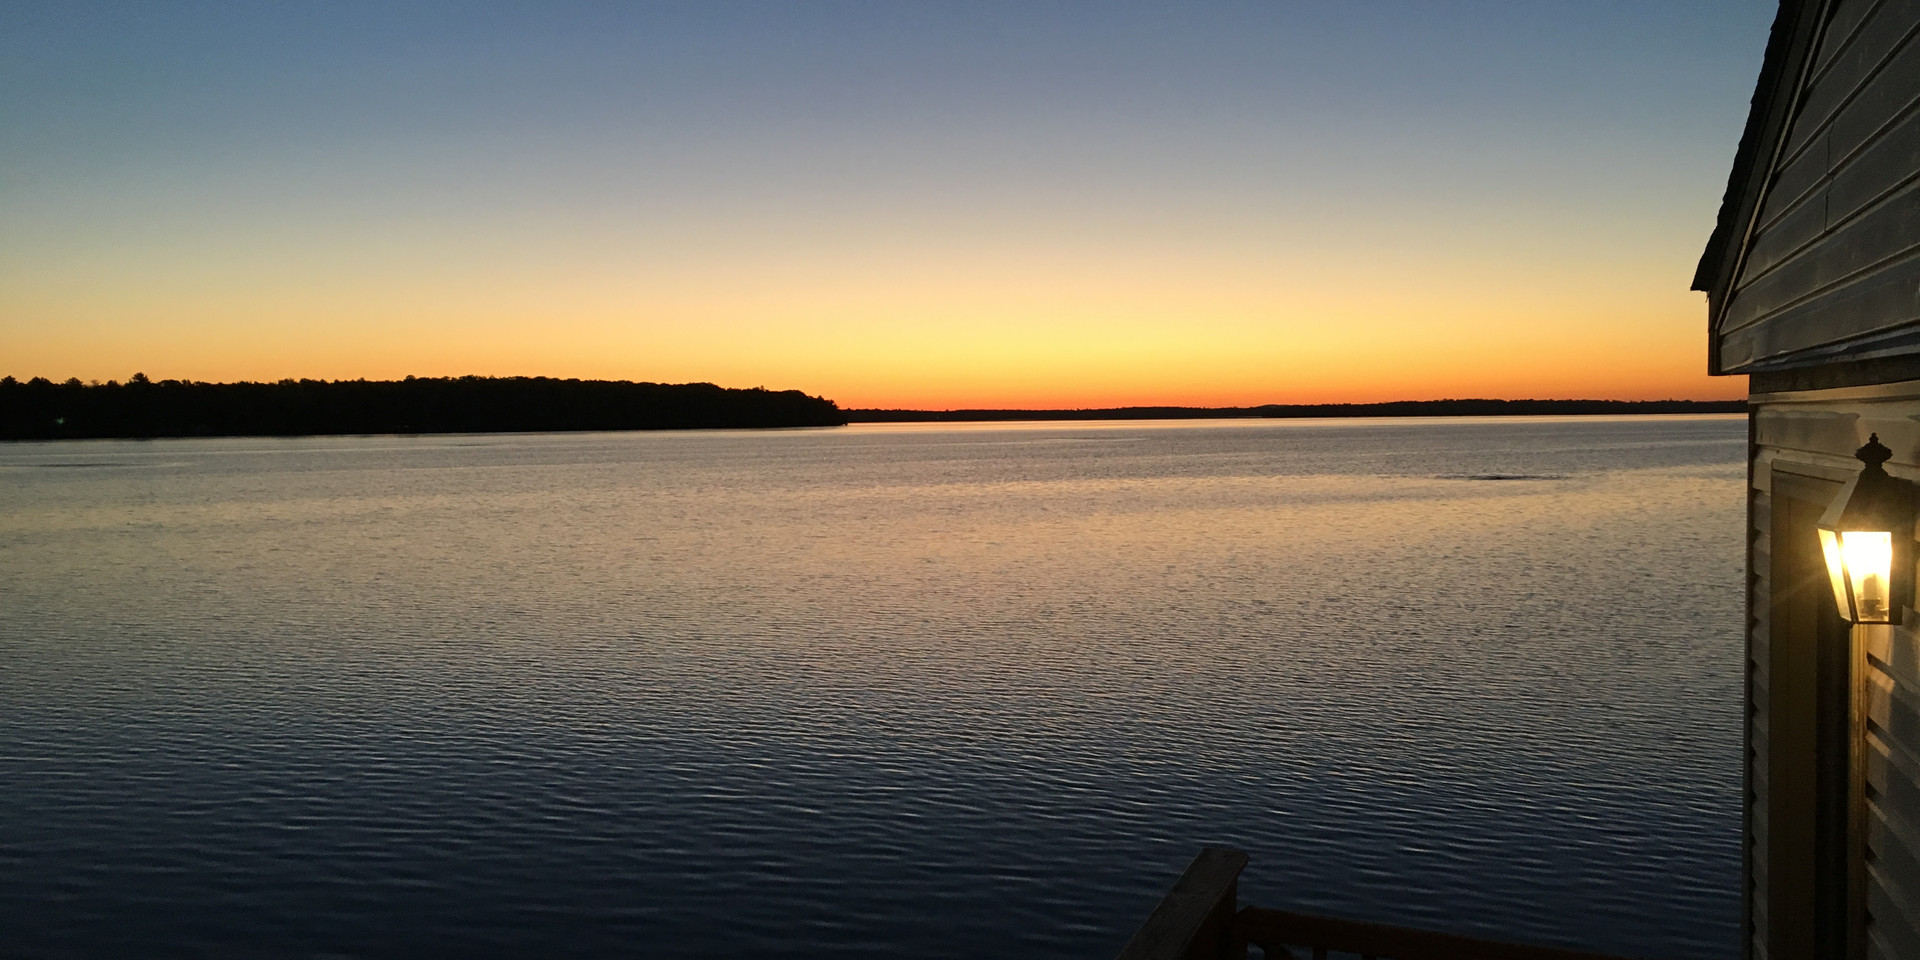 Lake view at breakfast